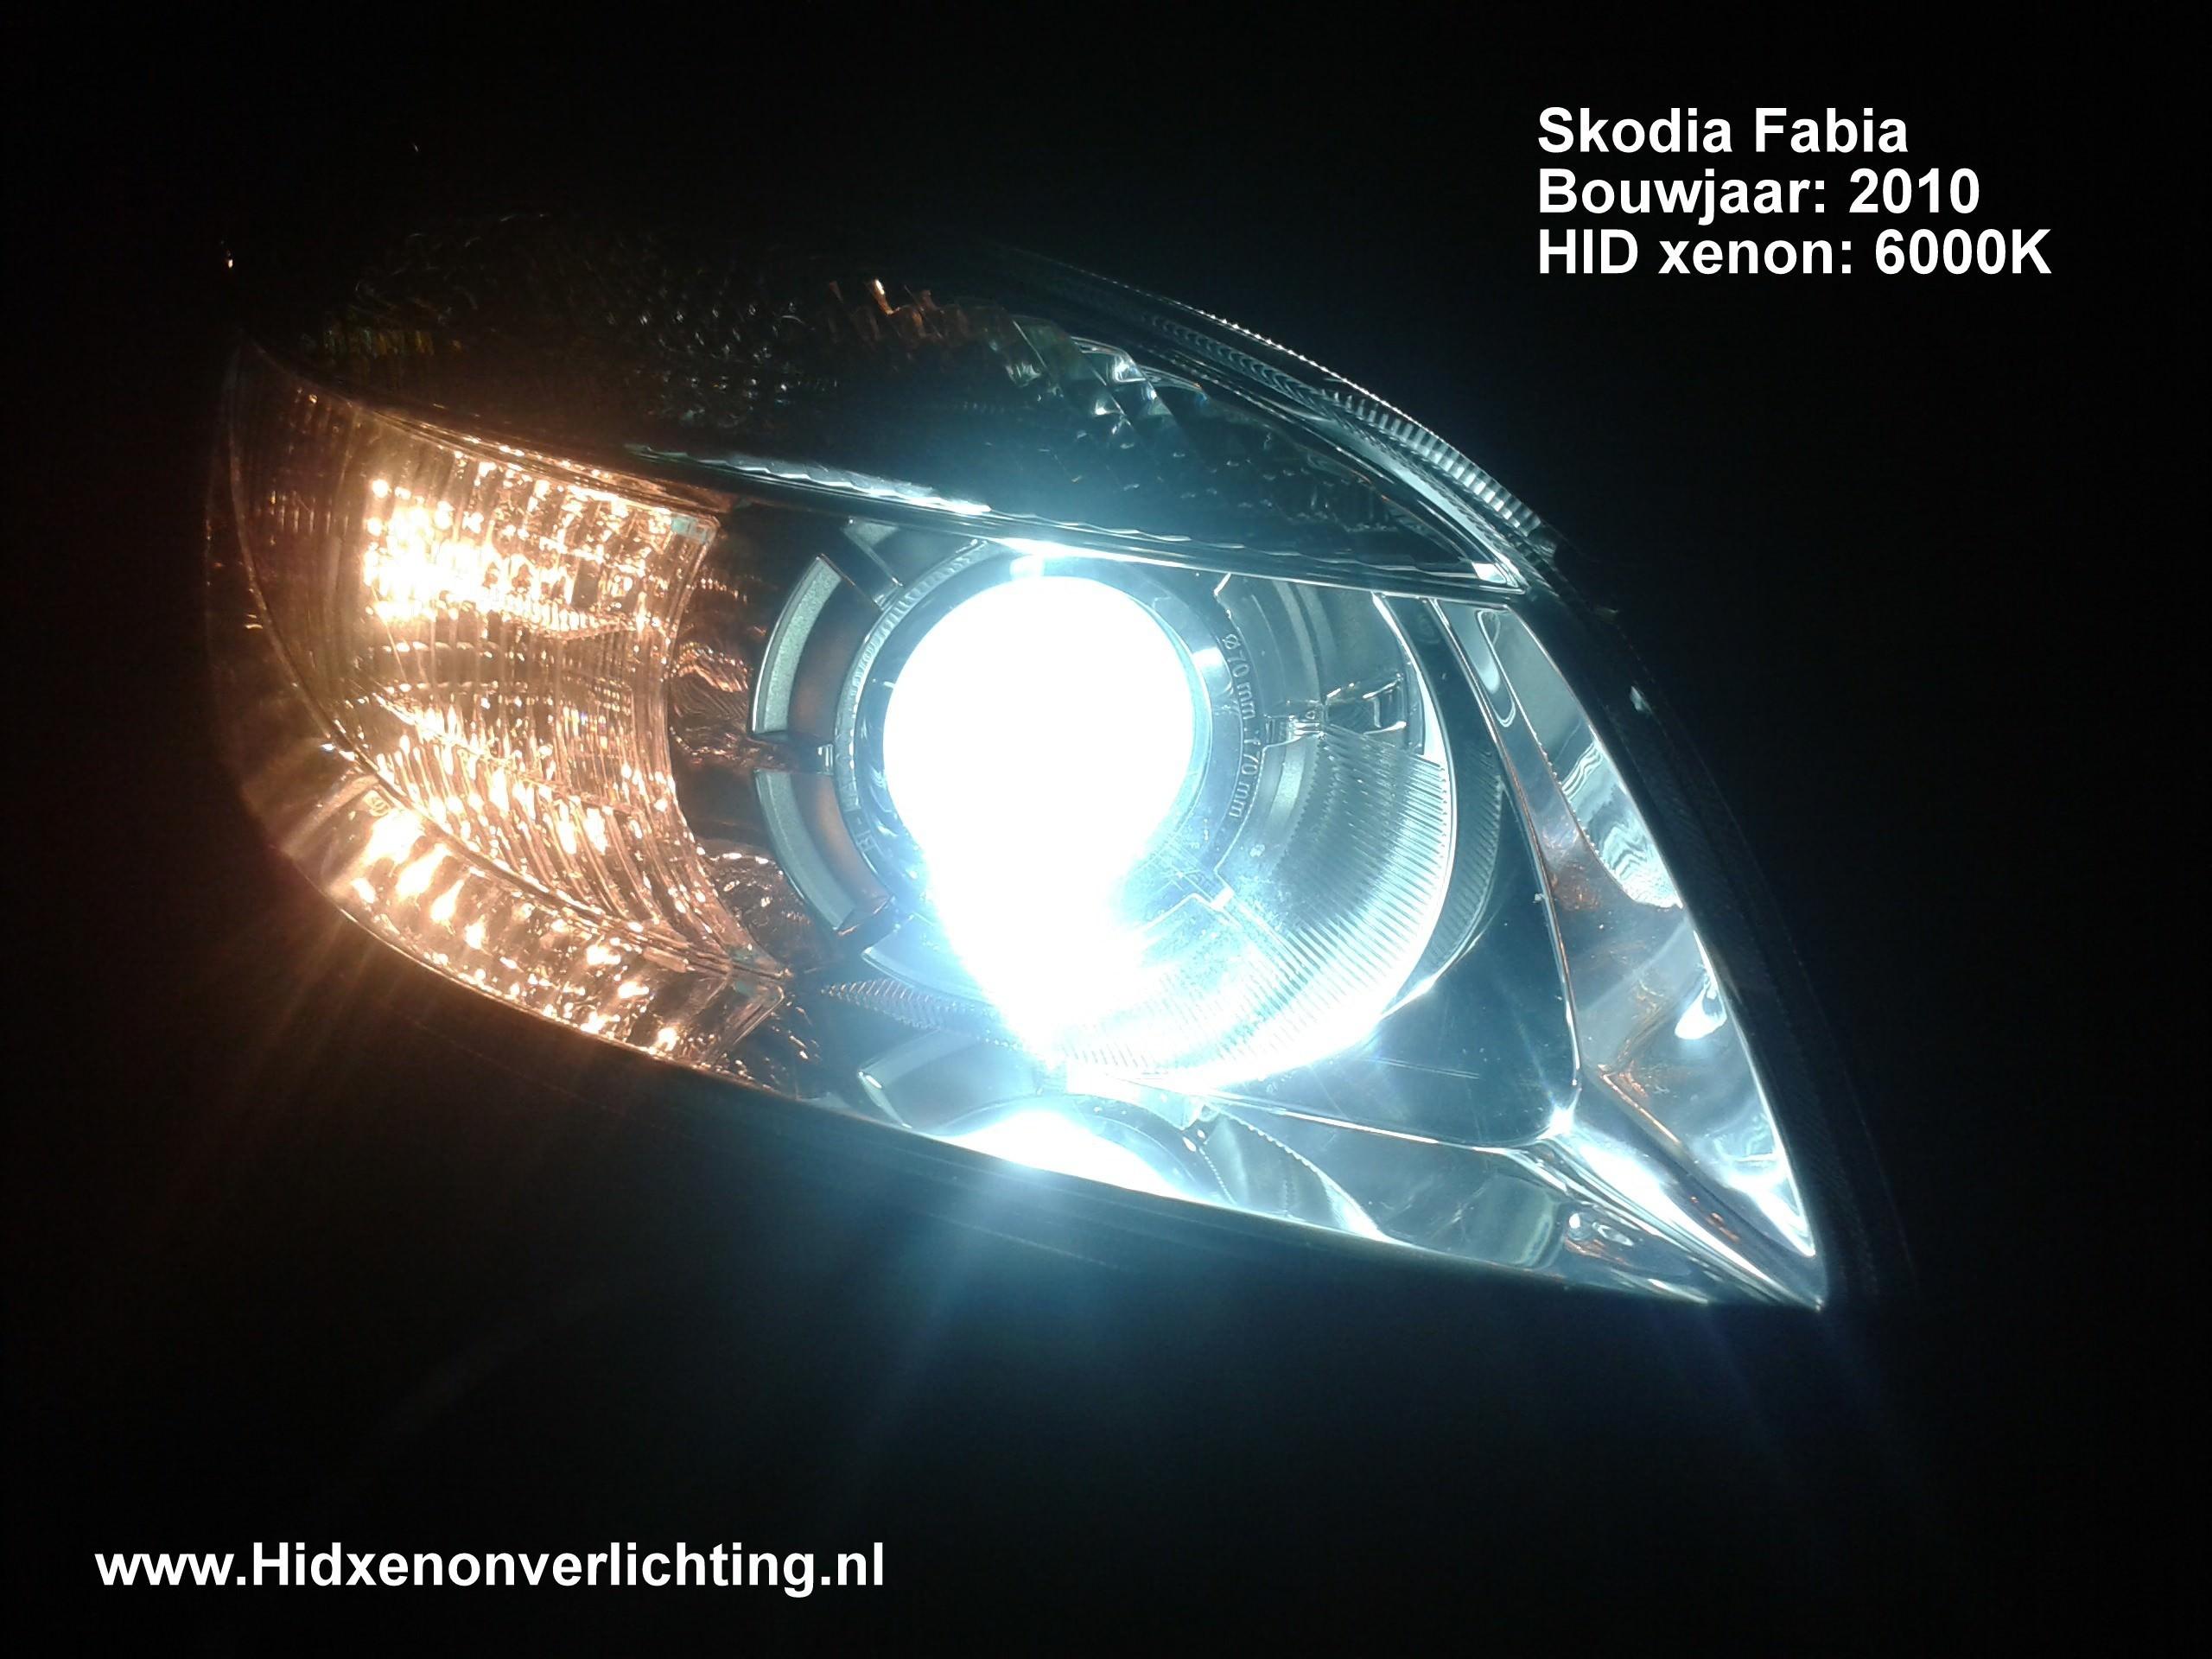 hid xenon kit pro can bus kopen hid xenon verlichting jpg 2560x1920 6000k xenon